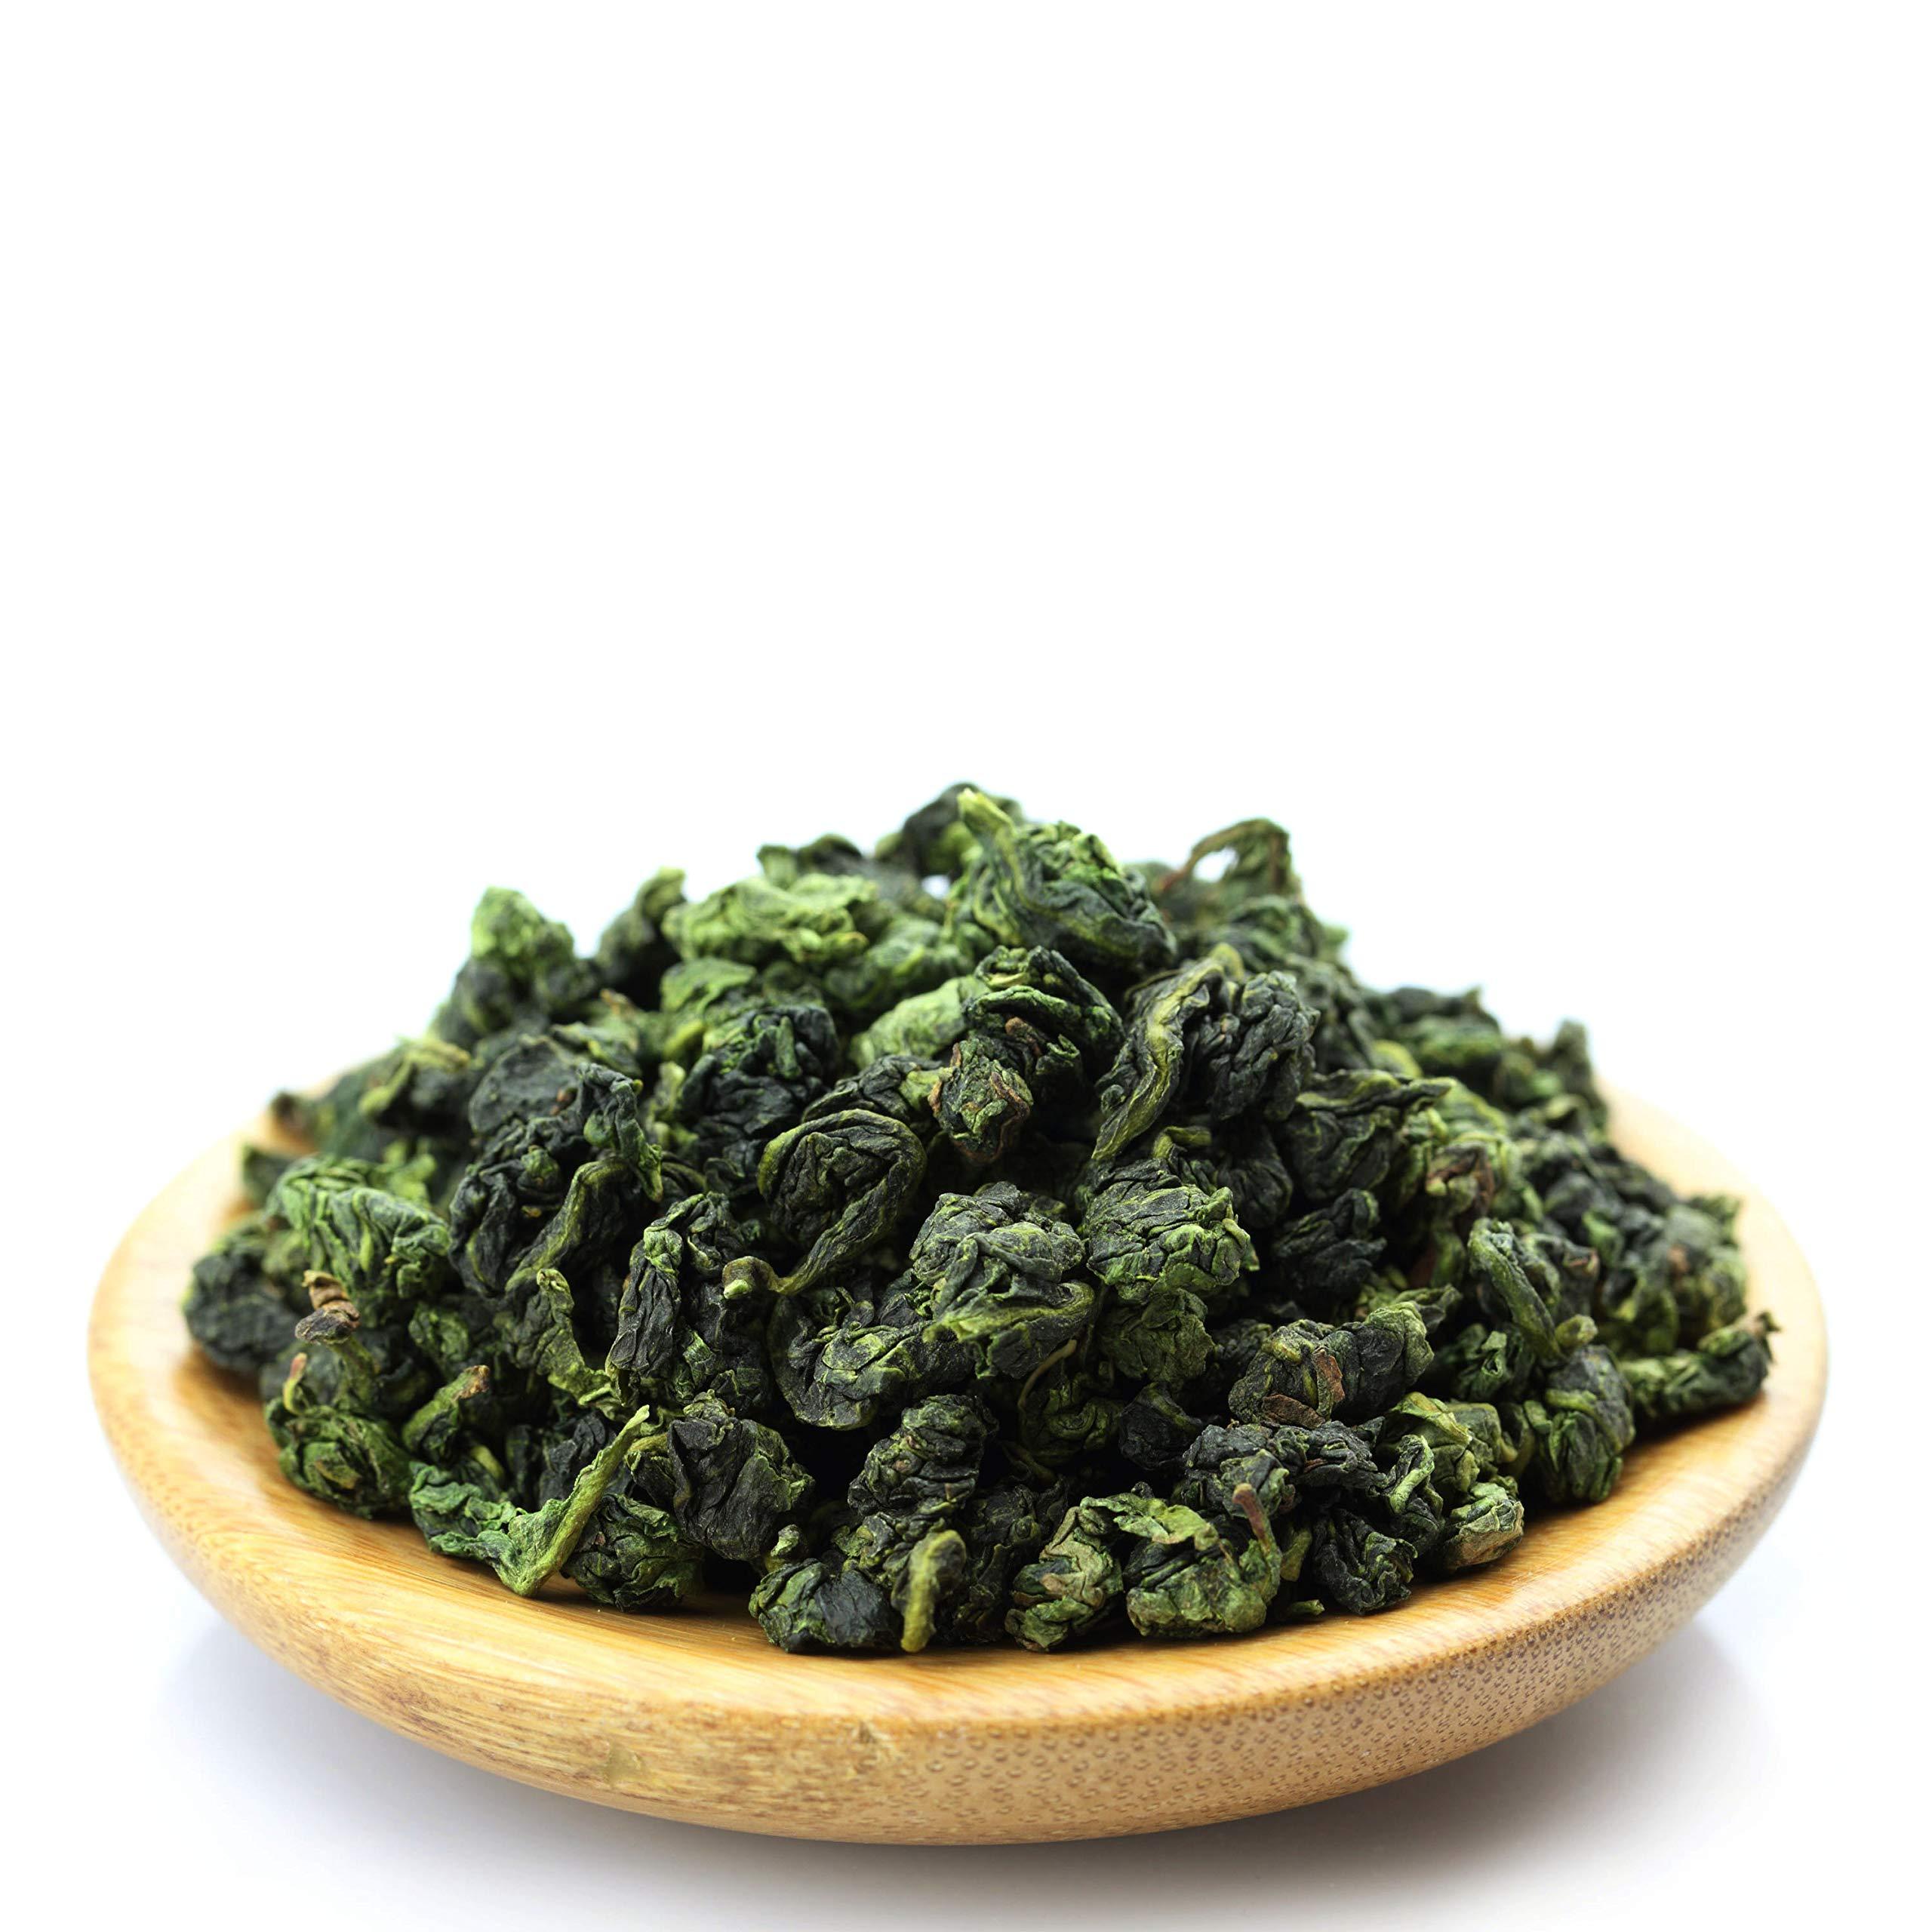 GOARTEA 1000g (35.2 Oz) Organic Supreme Fujian Anxi High Mount. Tie Guan Yin Tieguanyin Iron Goddess Chinese Oolong Tea ON SALE